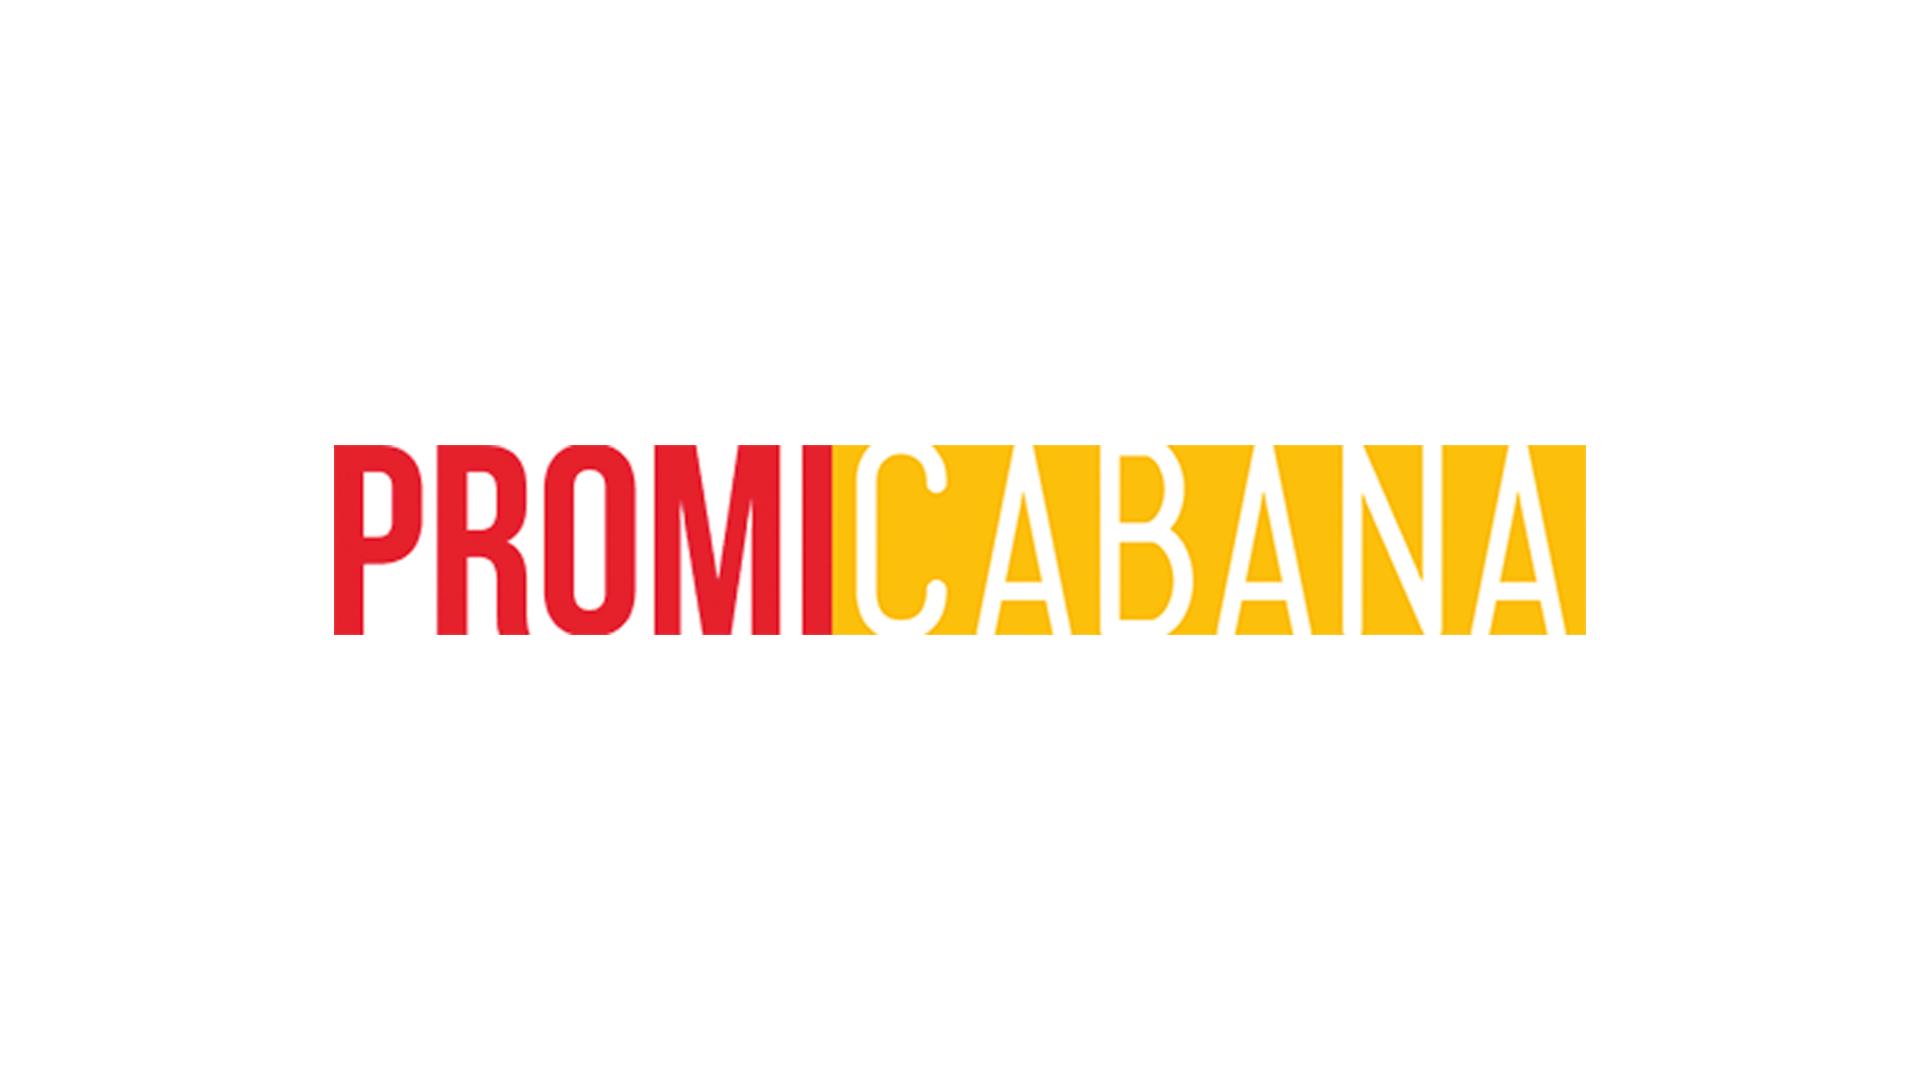 Justin-Timberlake-iHeartRadio-Music-Awards-2015